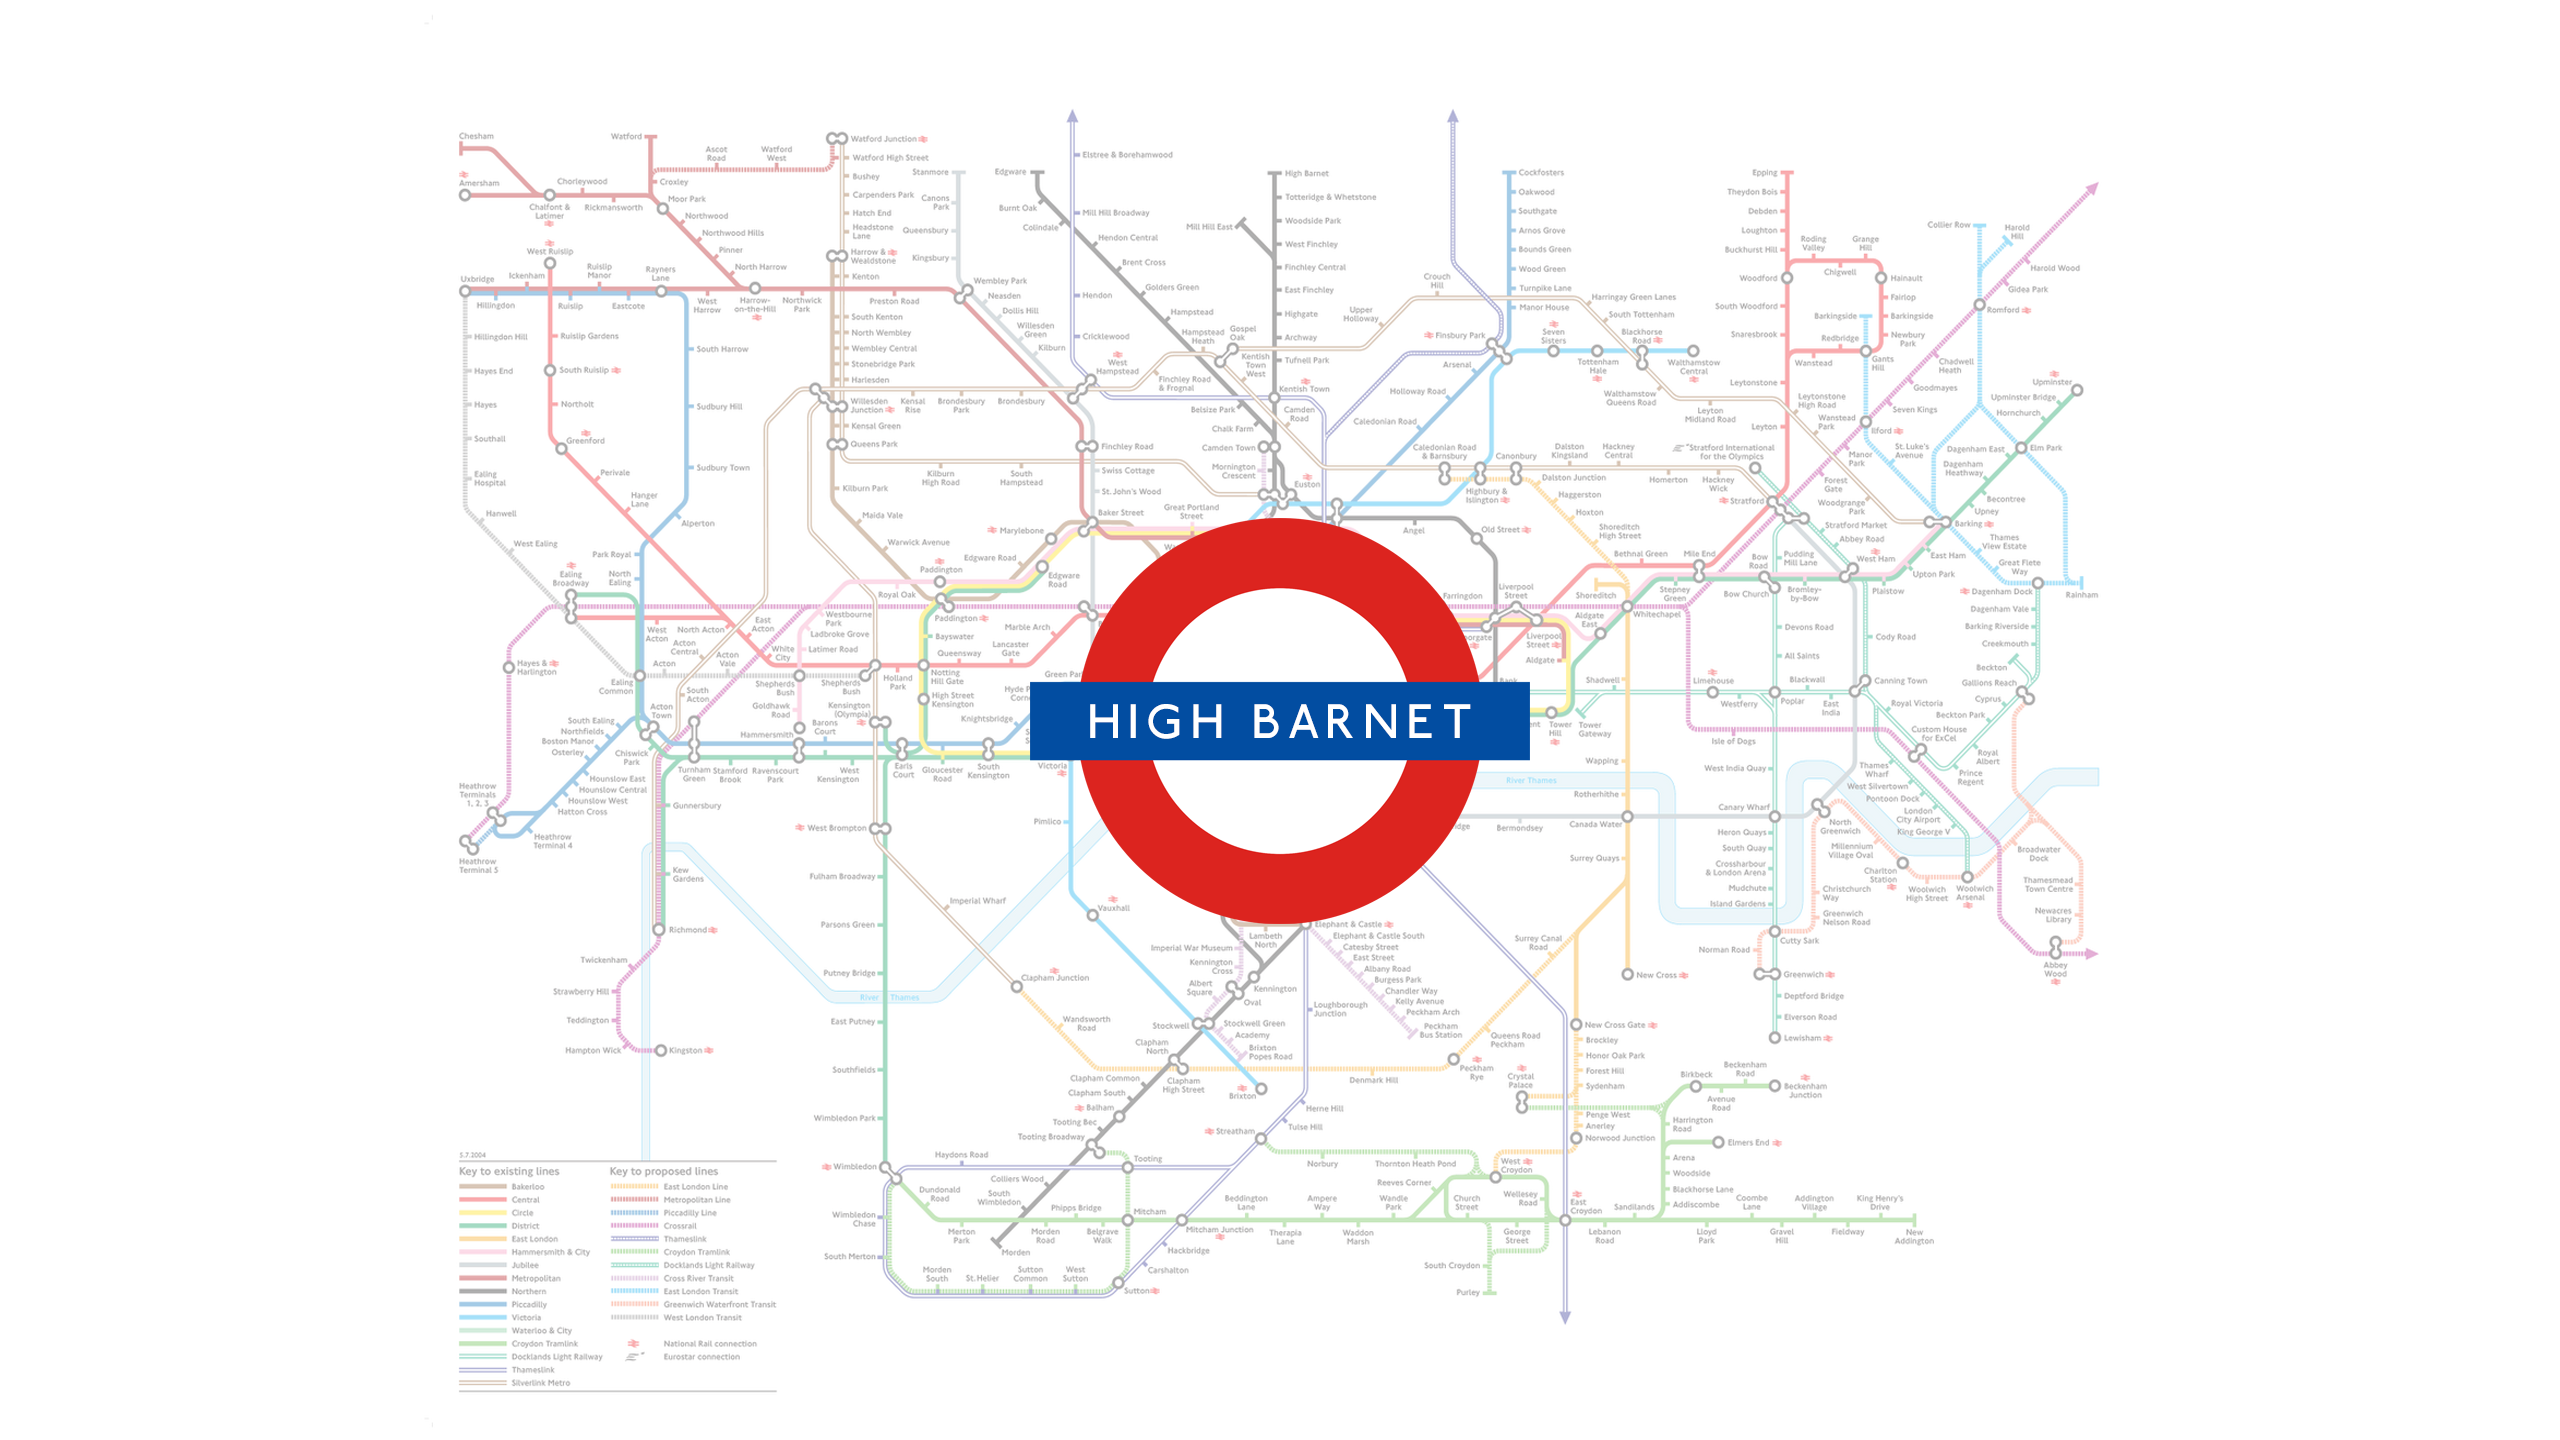 High Barnet (Map)